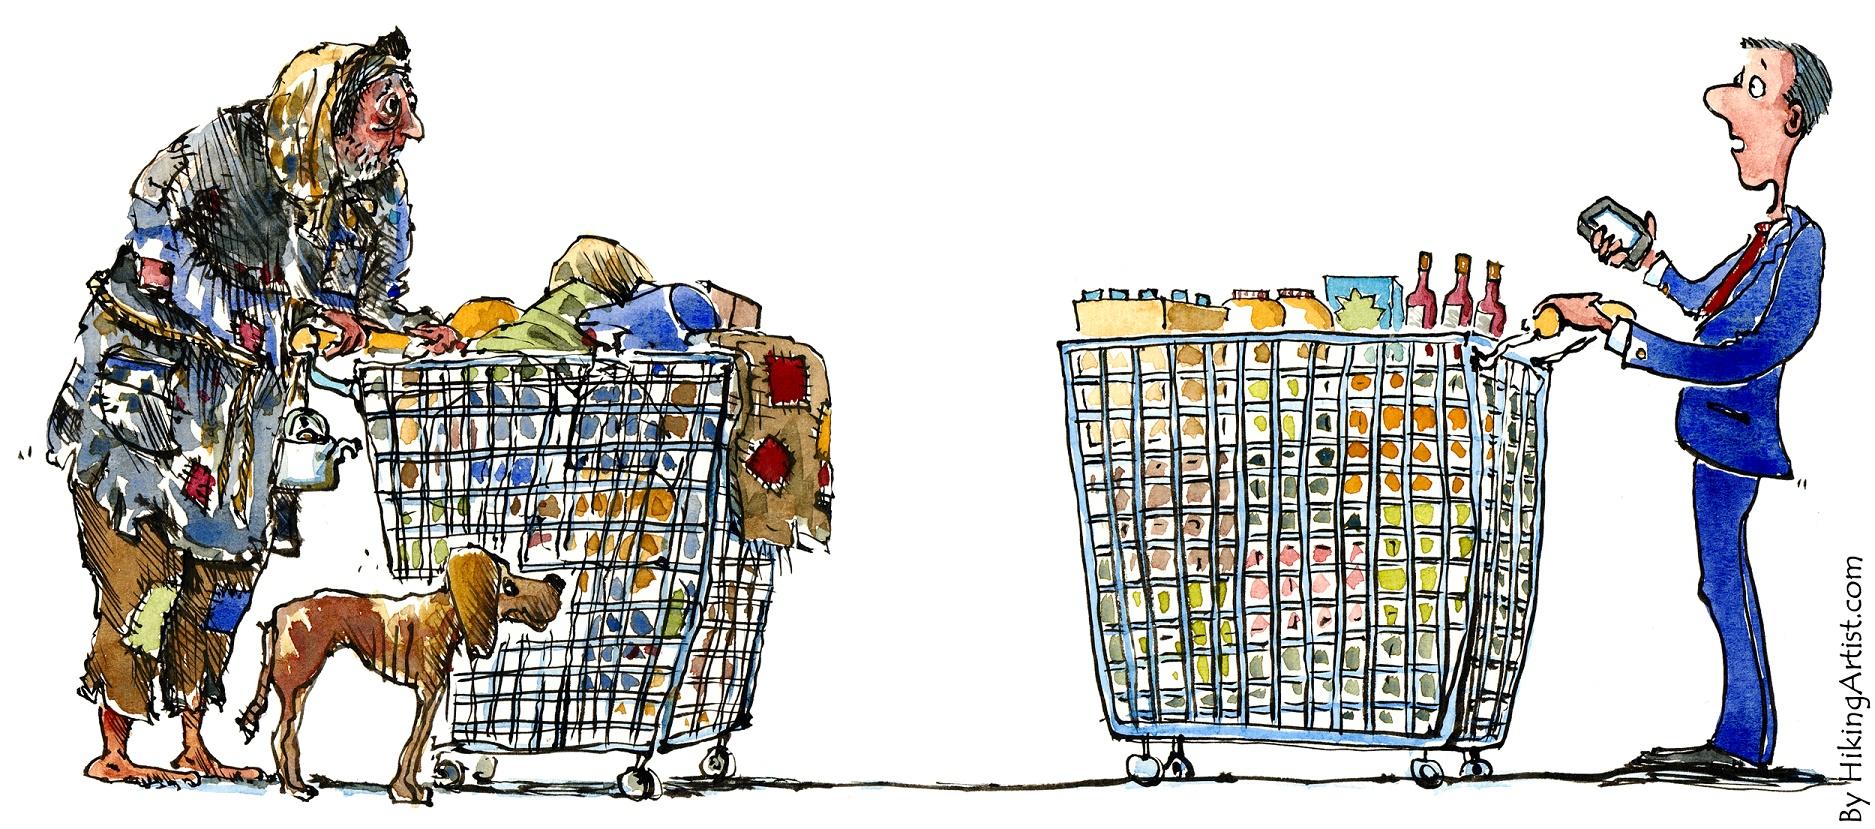 desigualdade/ Frits Ahlefeldt -Laurvig